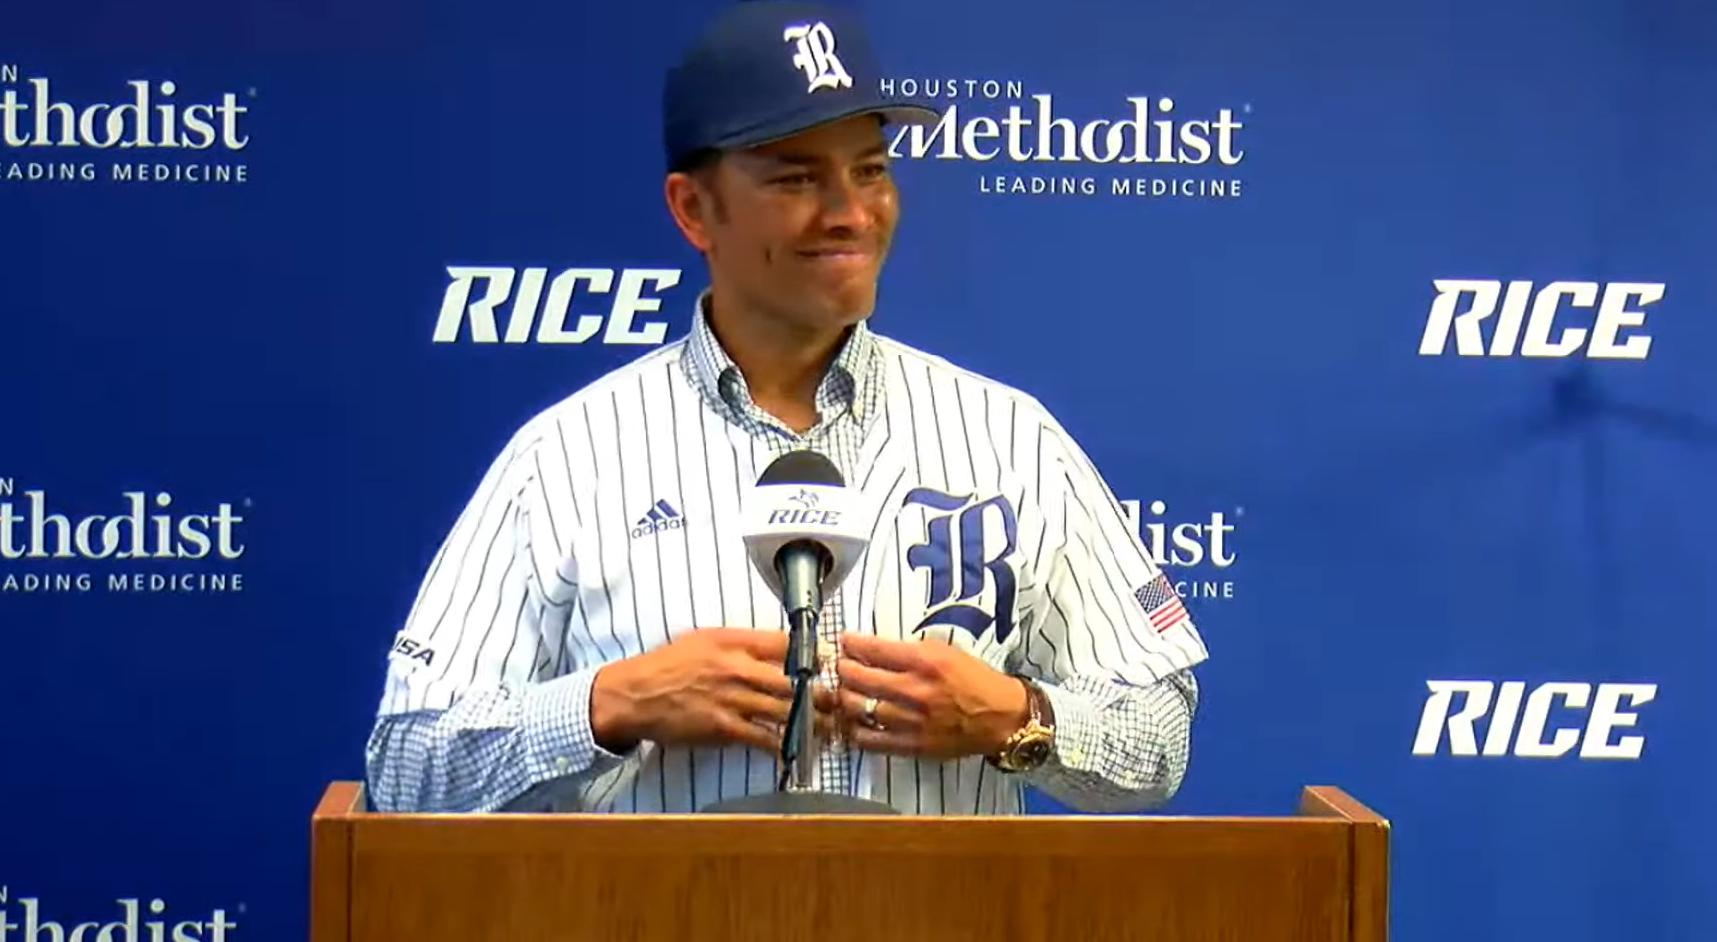 Rice Baseball, Jose Cruz Jr.